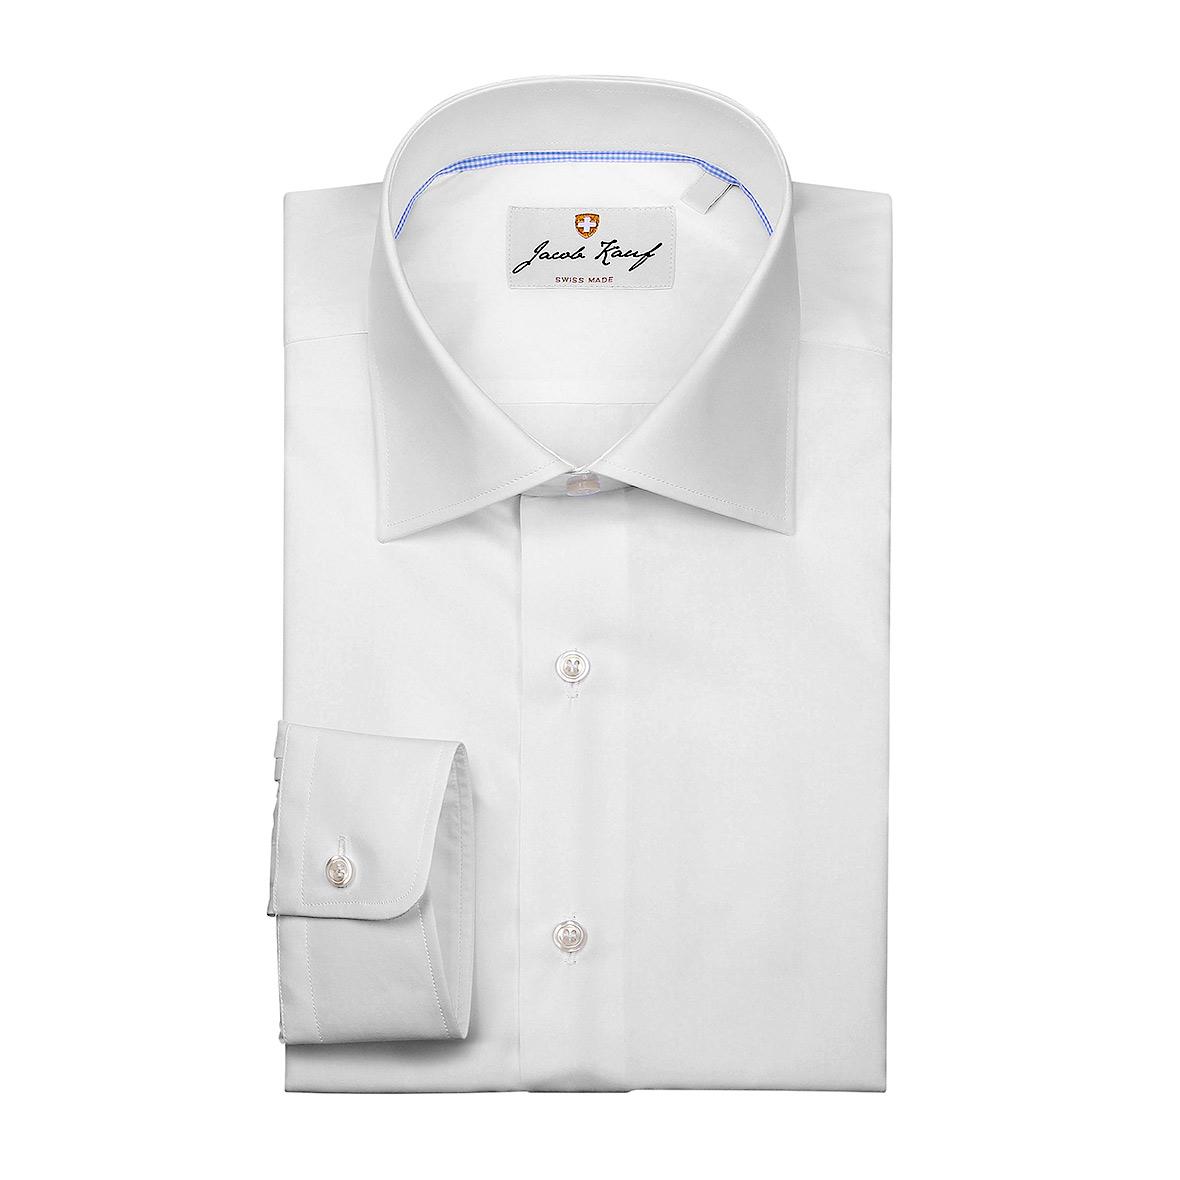 Schweizer Hemd Jacob Kauf, weiss